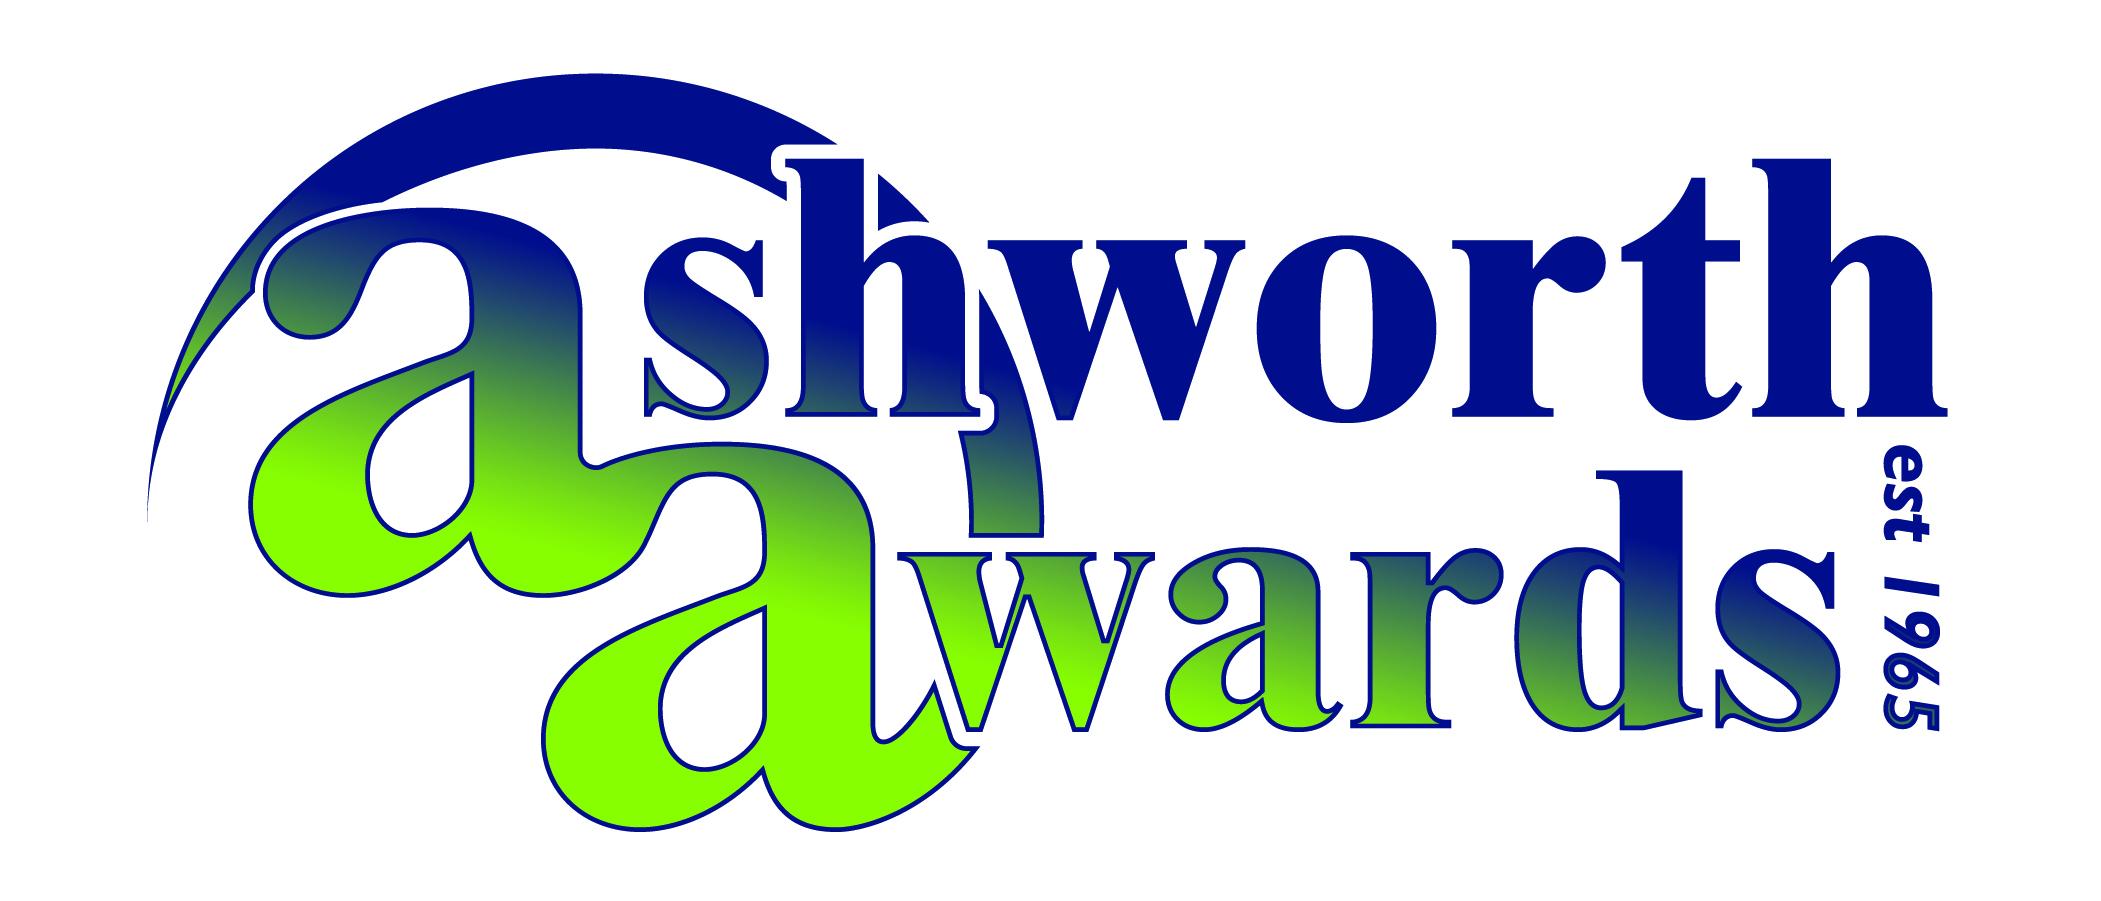 Logo of Ashworth Awards